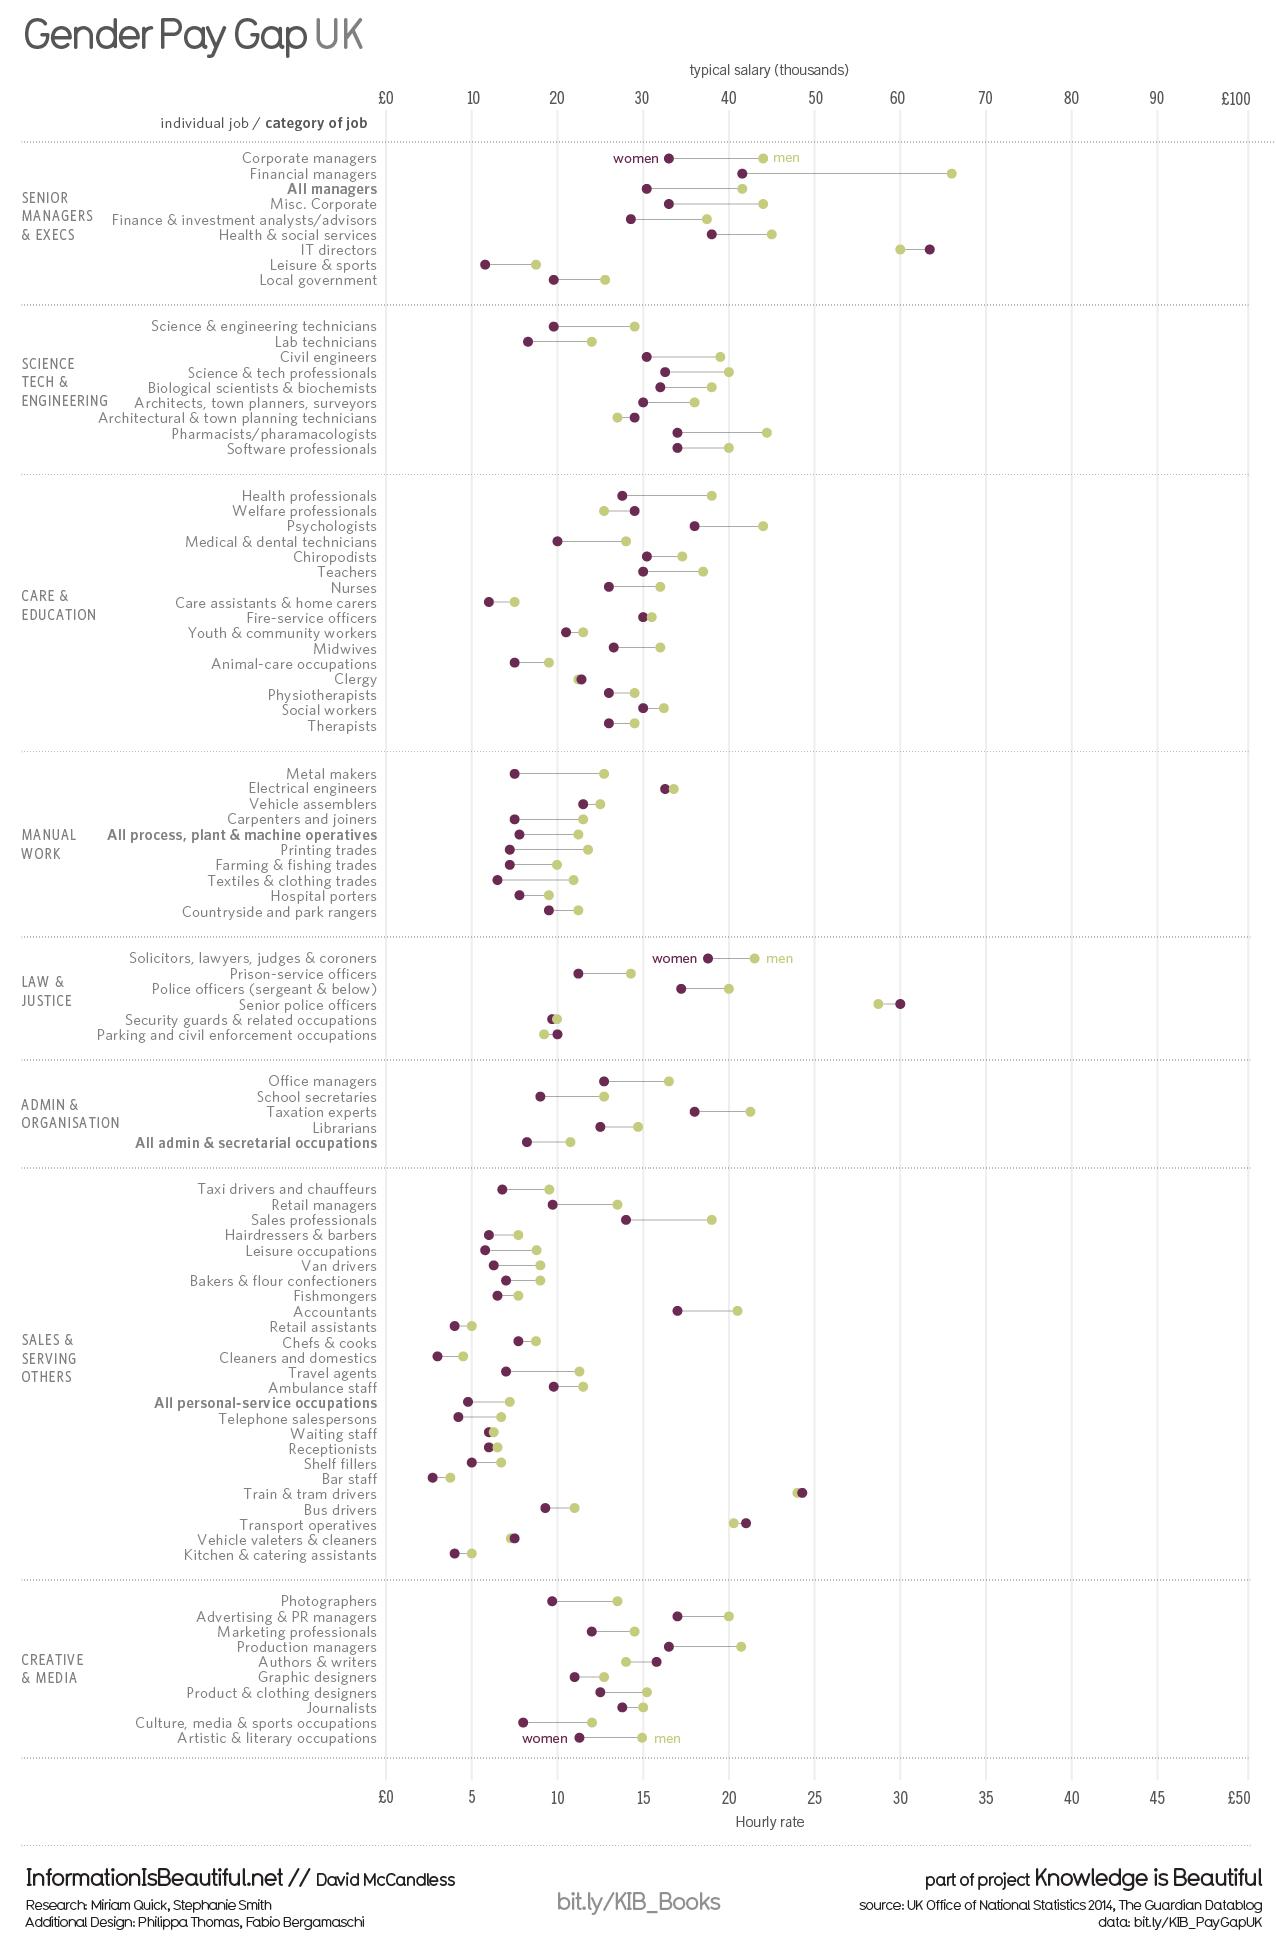 http://www.informationisbeautiful.net/visualizations/gender-pay-gap-uk/